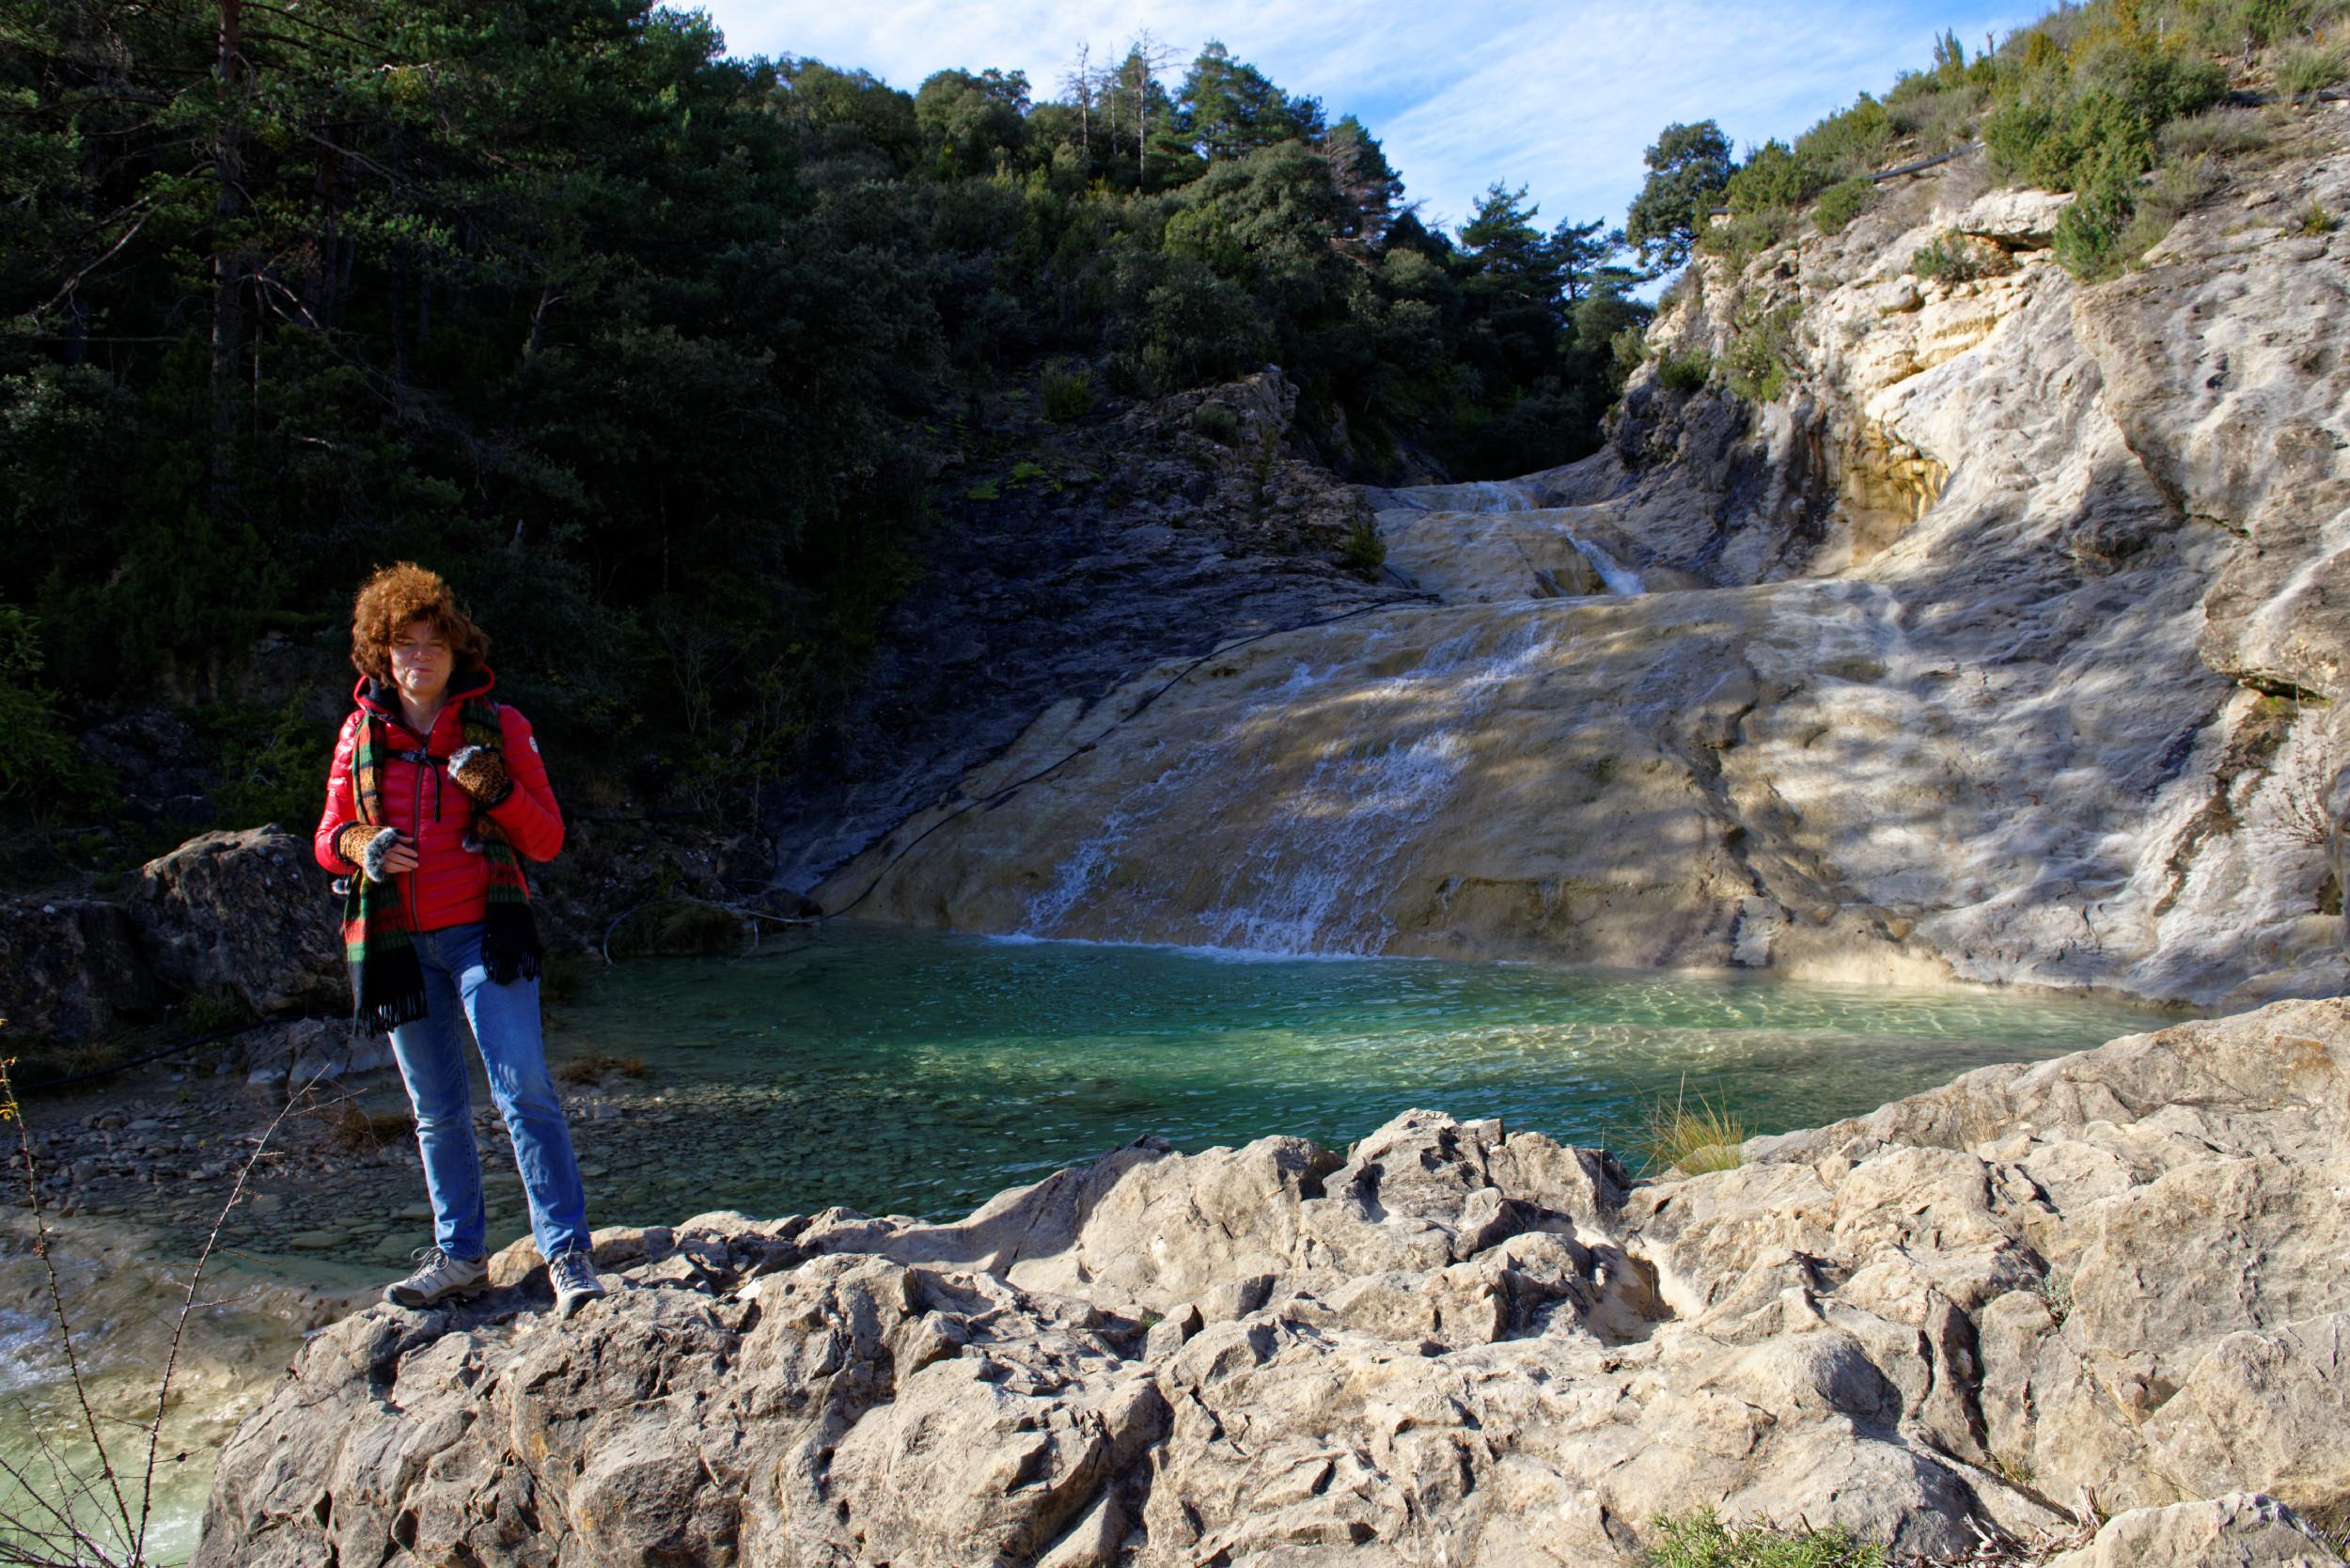 141208-Sieste - Canyon et Barranco (Sobrarbe) (12)